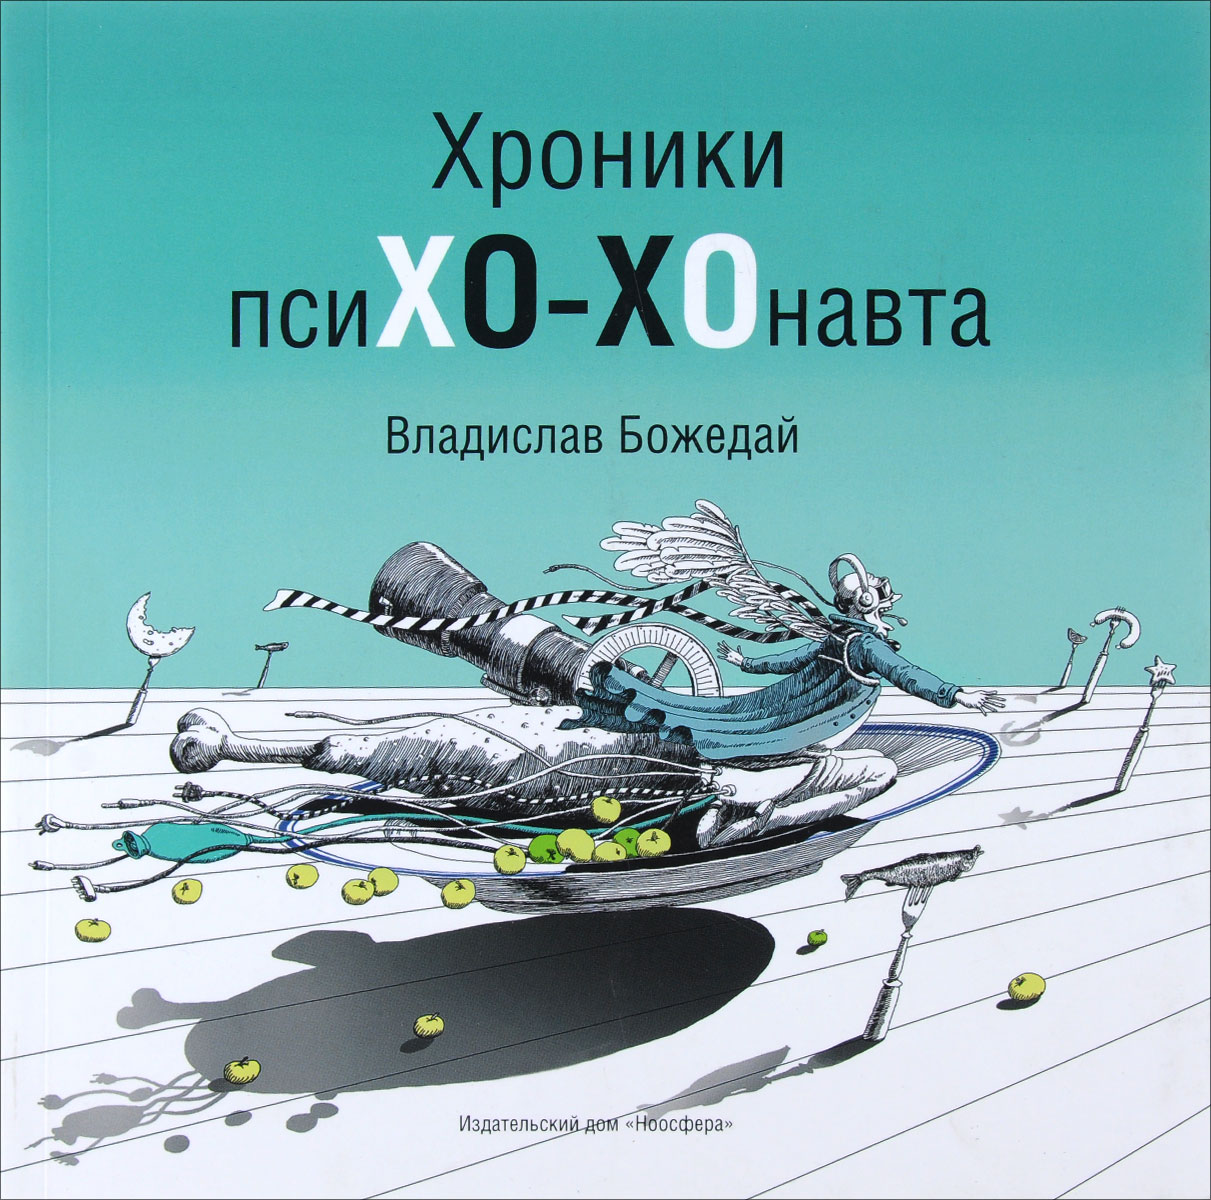 Хроники псиХО-ХОнавта. Владислав Божедай